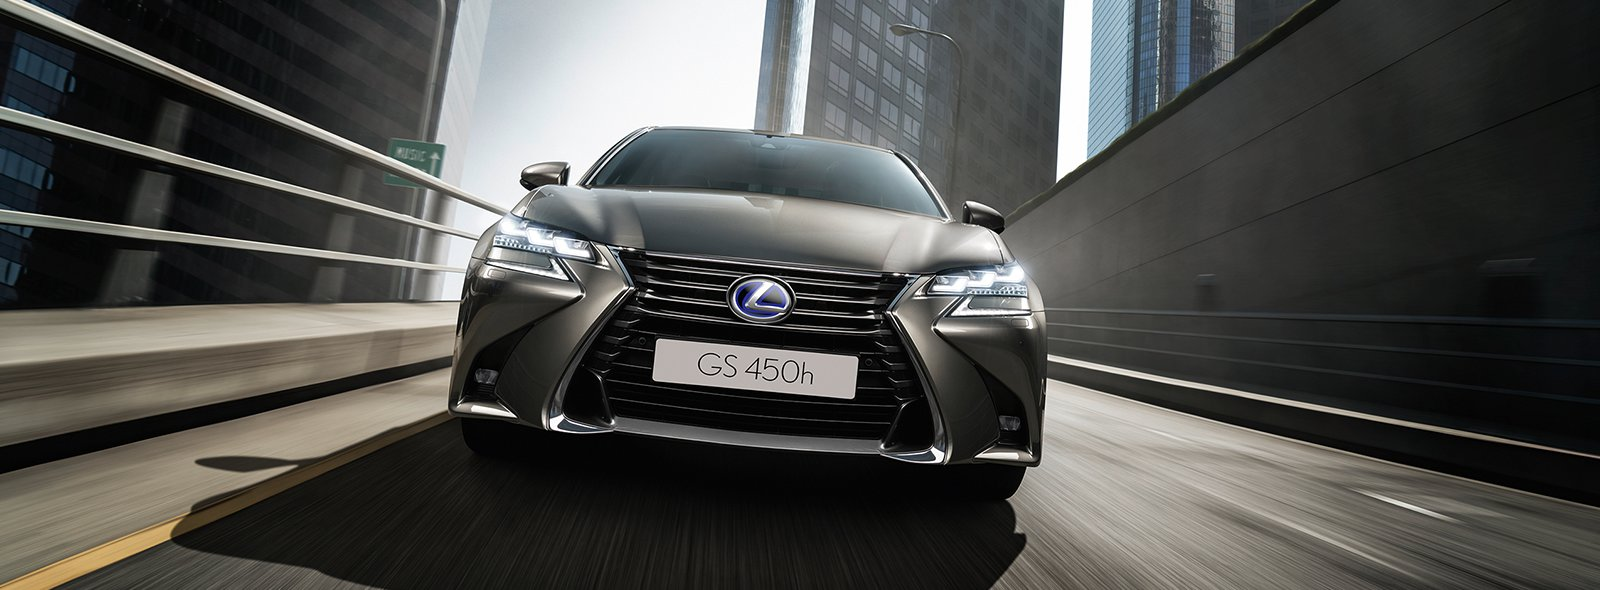 Lexus GS 450h Hybrid keula